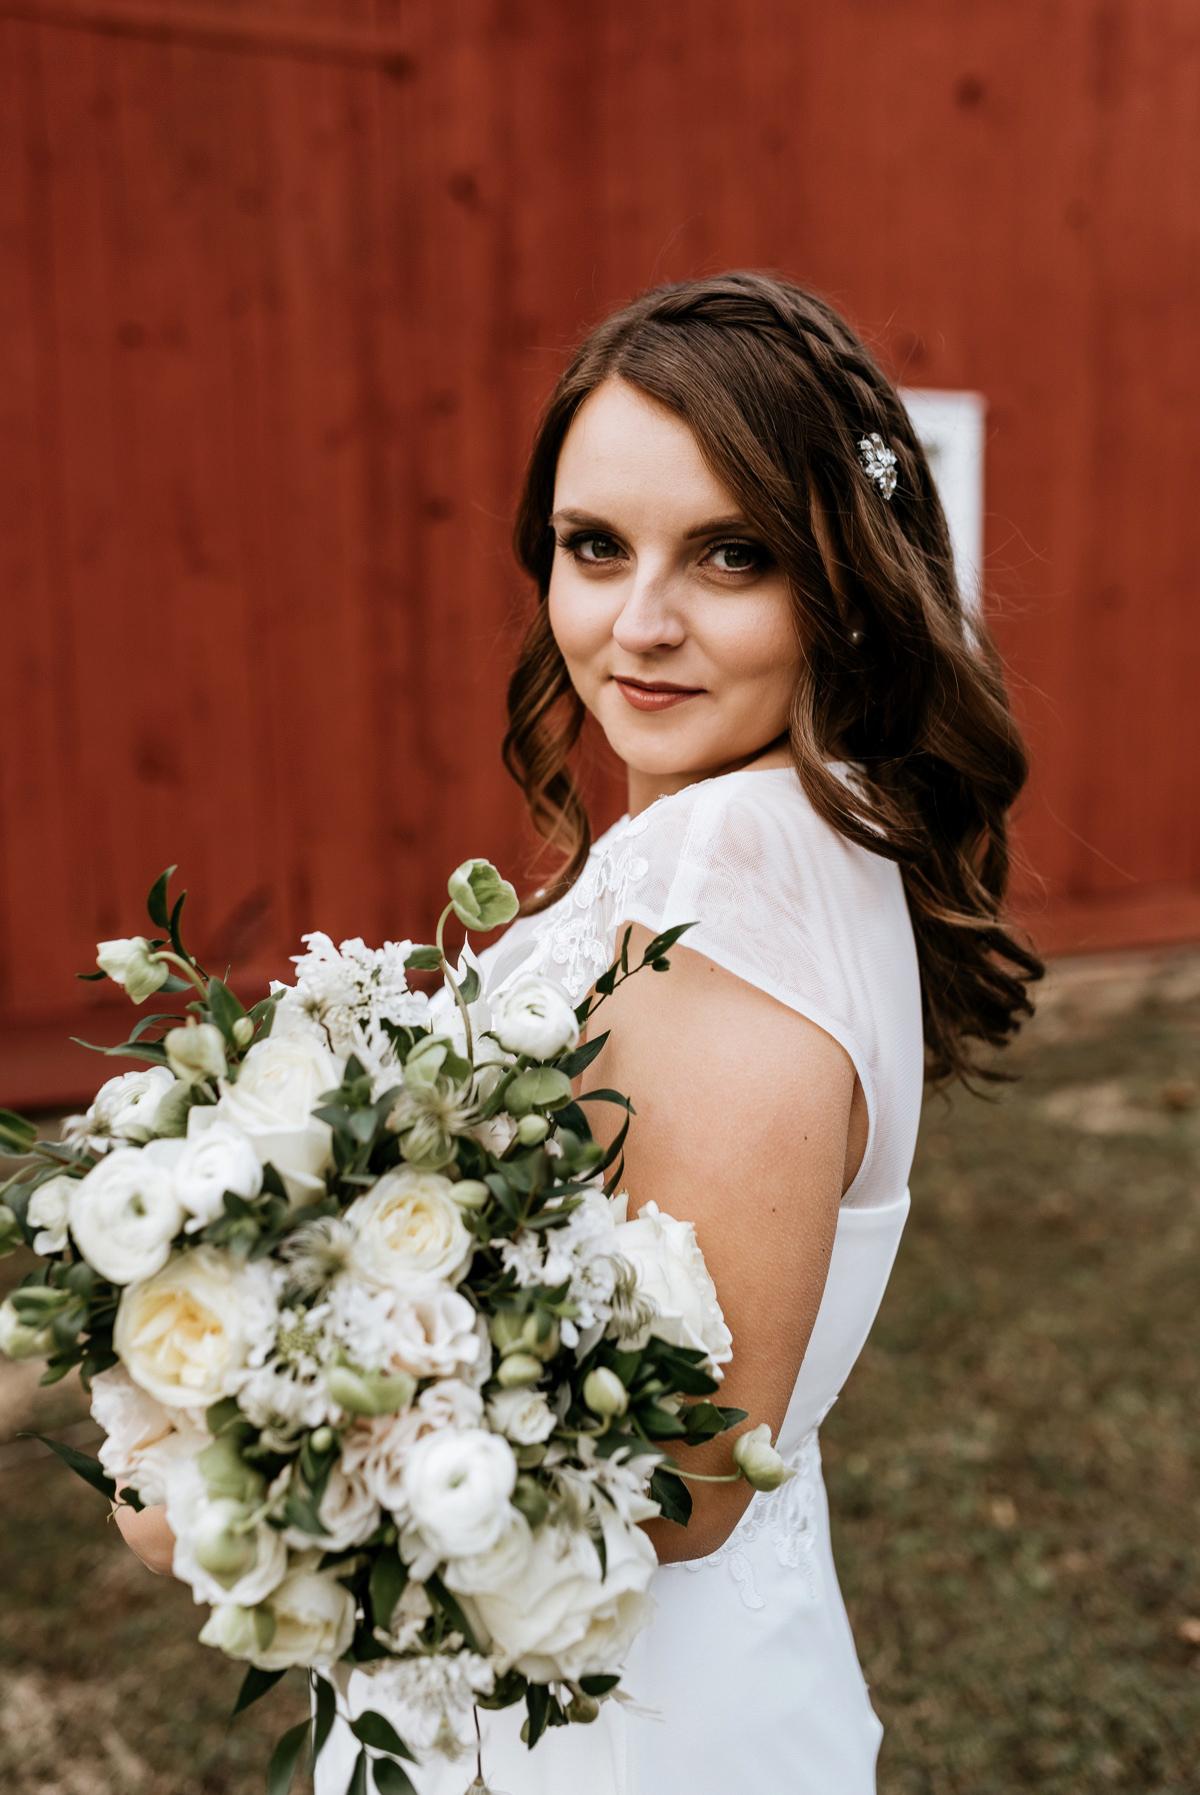 34 Vermont Wedding Photographer The Inn At Glencairn Barn Wedding Inspiration Winter Elopement Intimate Wedding